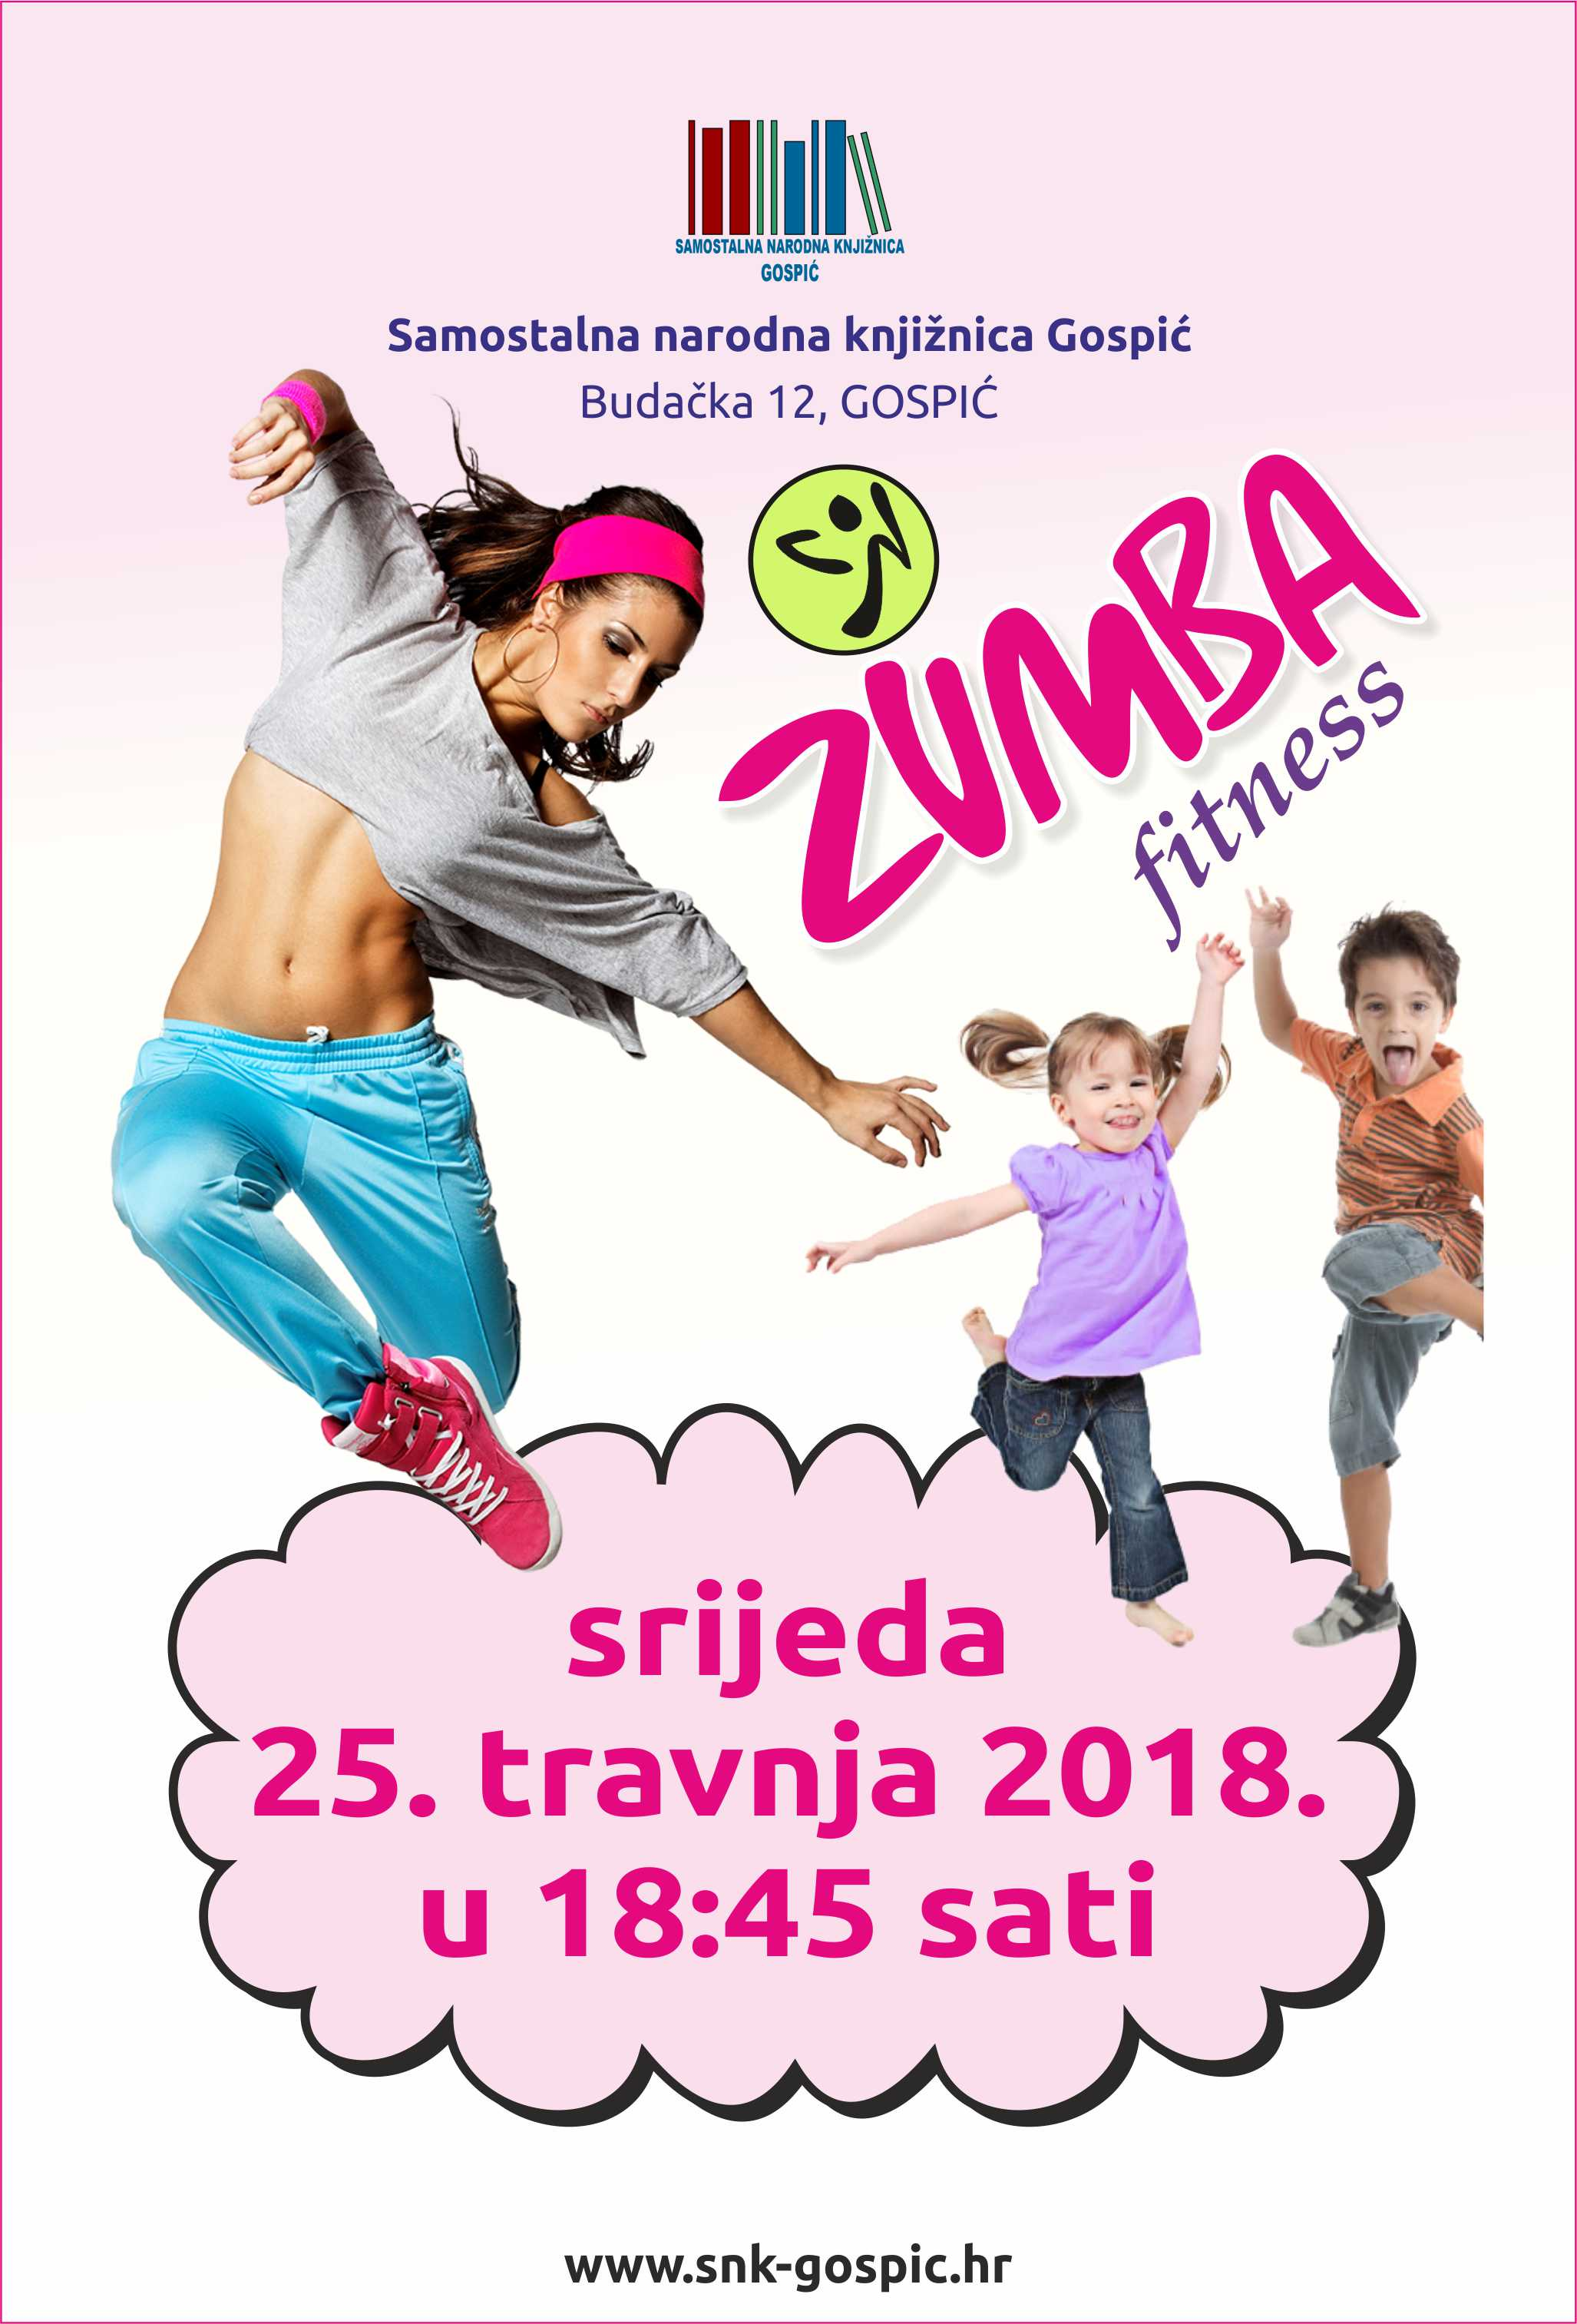 SNK-Zumba Fitnes